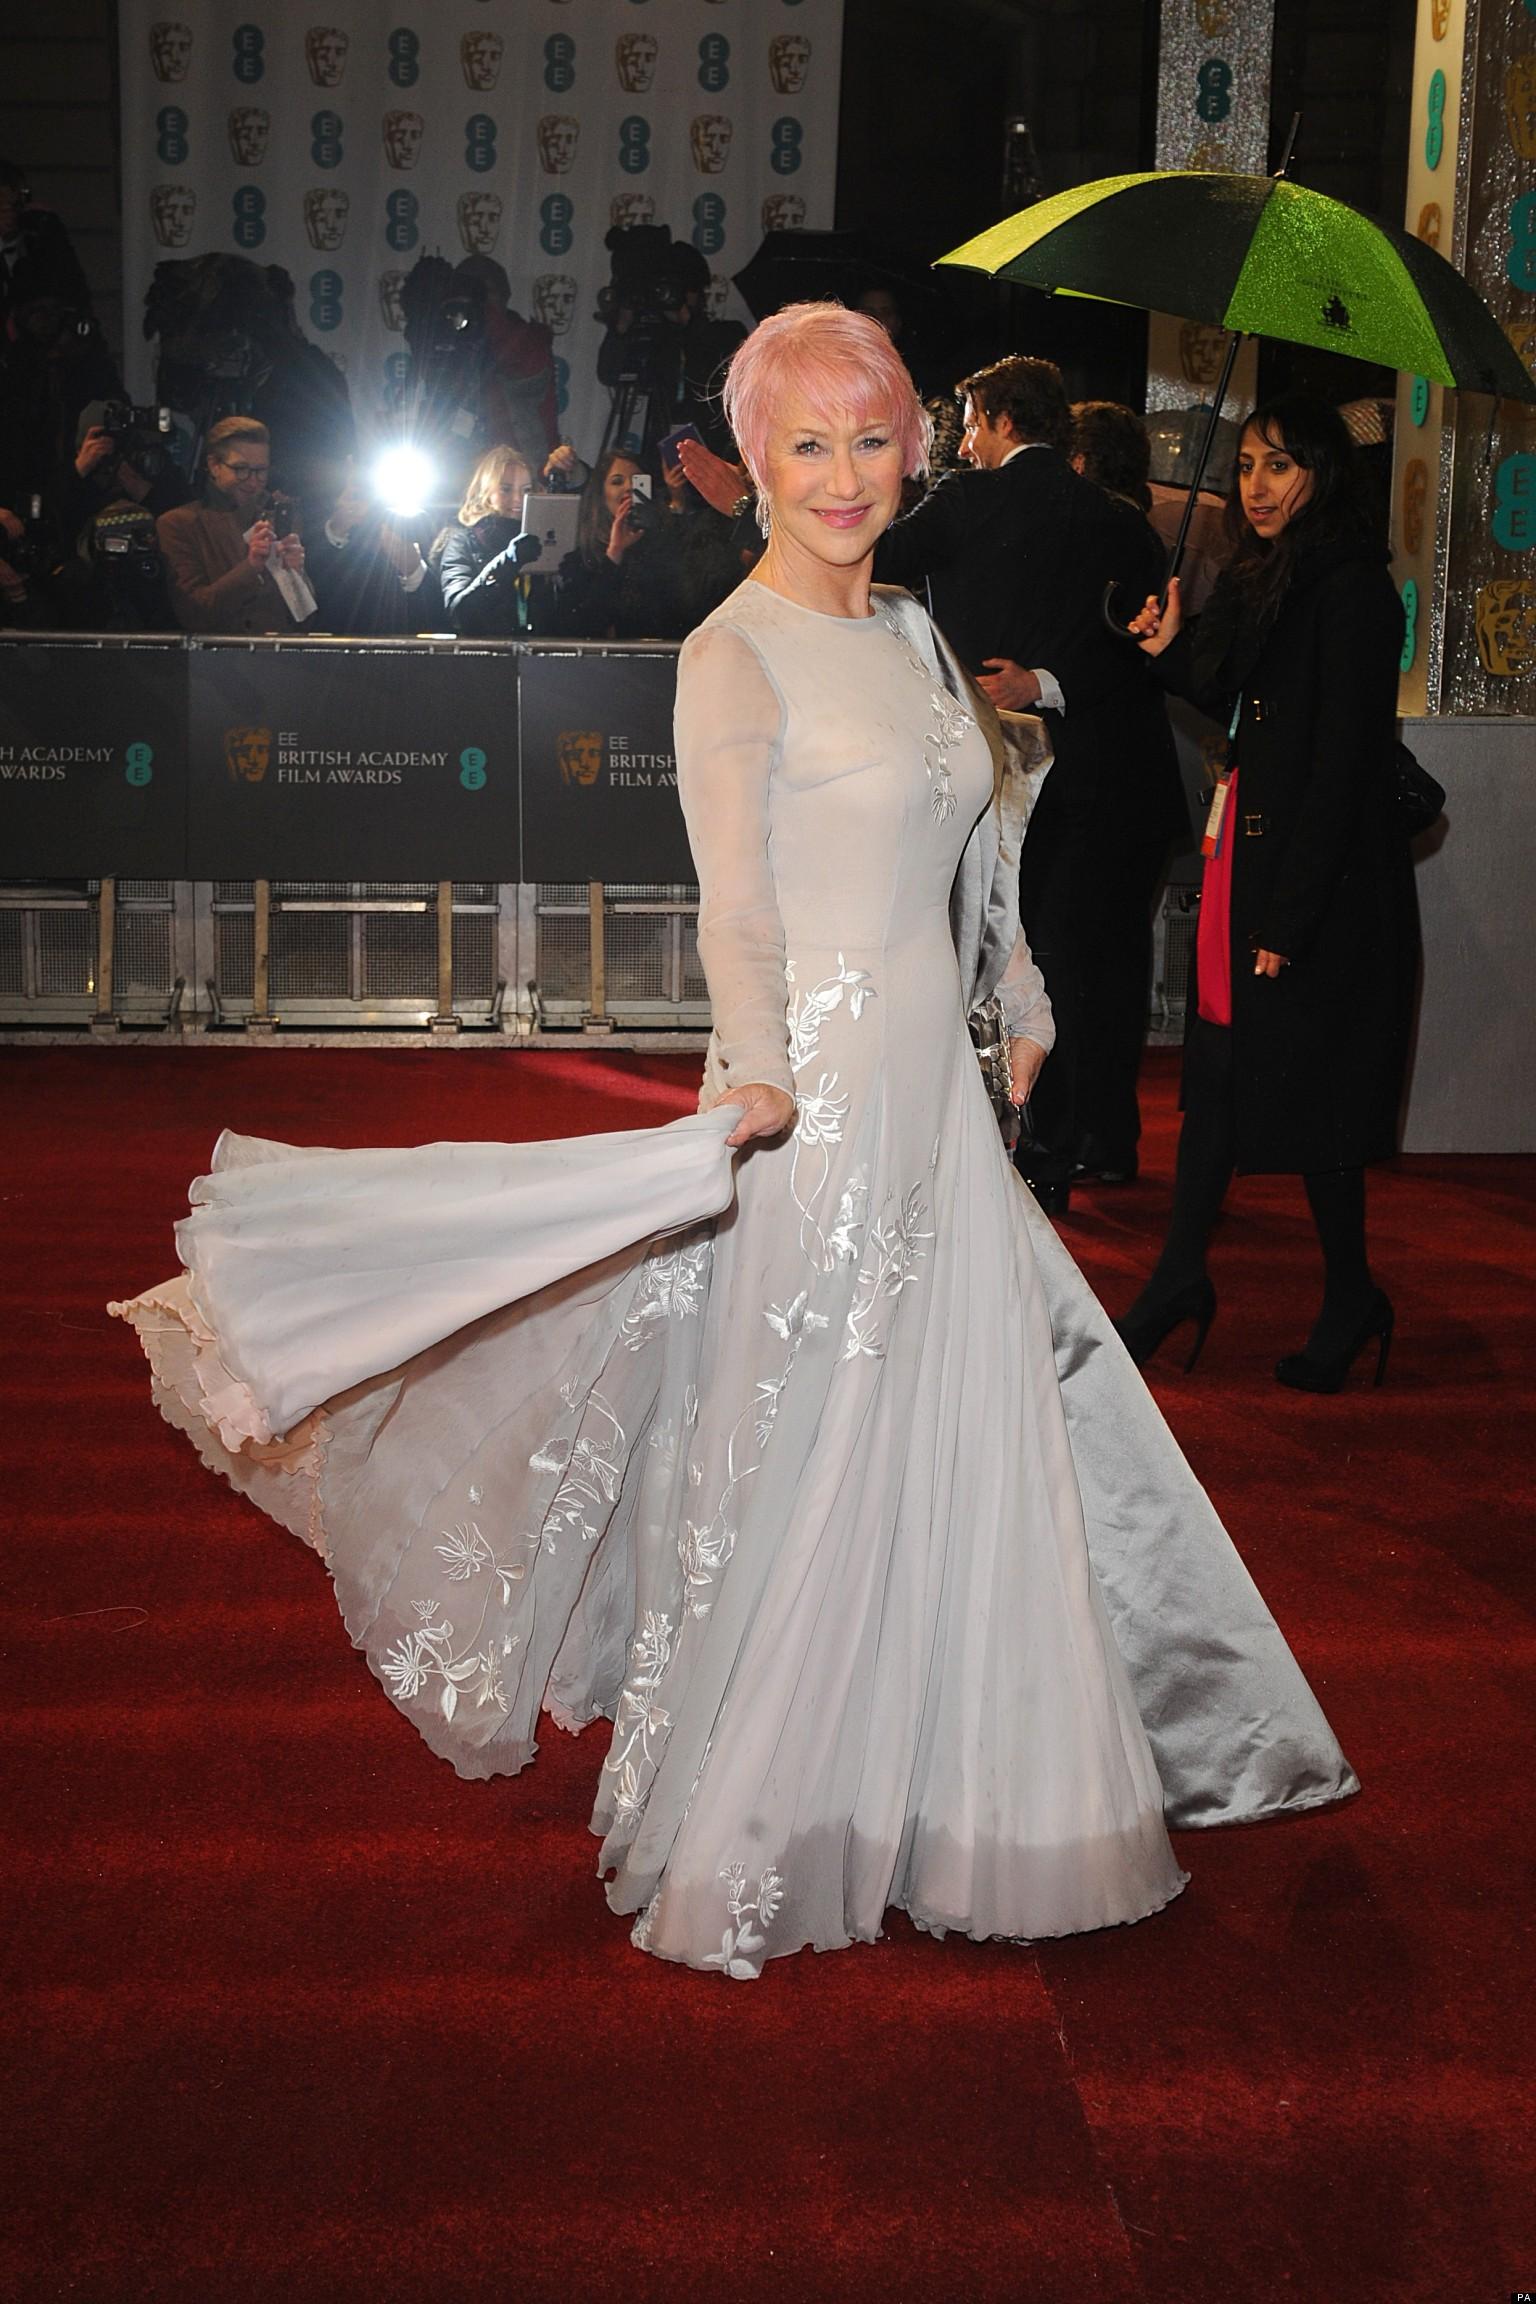 Baftas 2013 Helen Mirren Debuts Pink Hair On Red Carpet